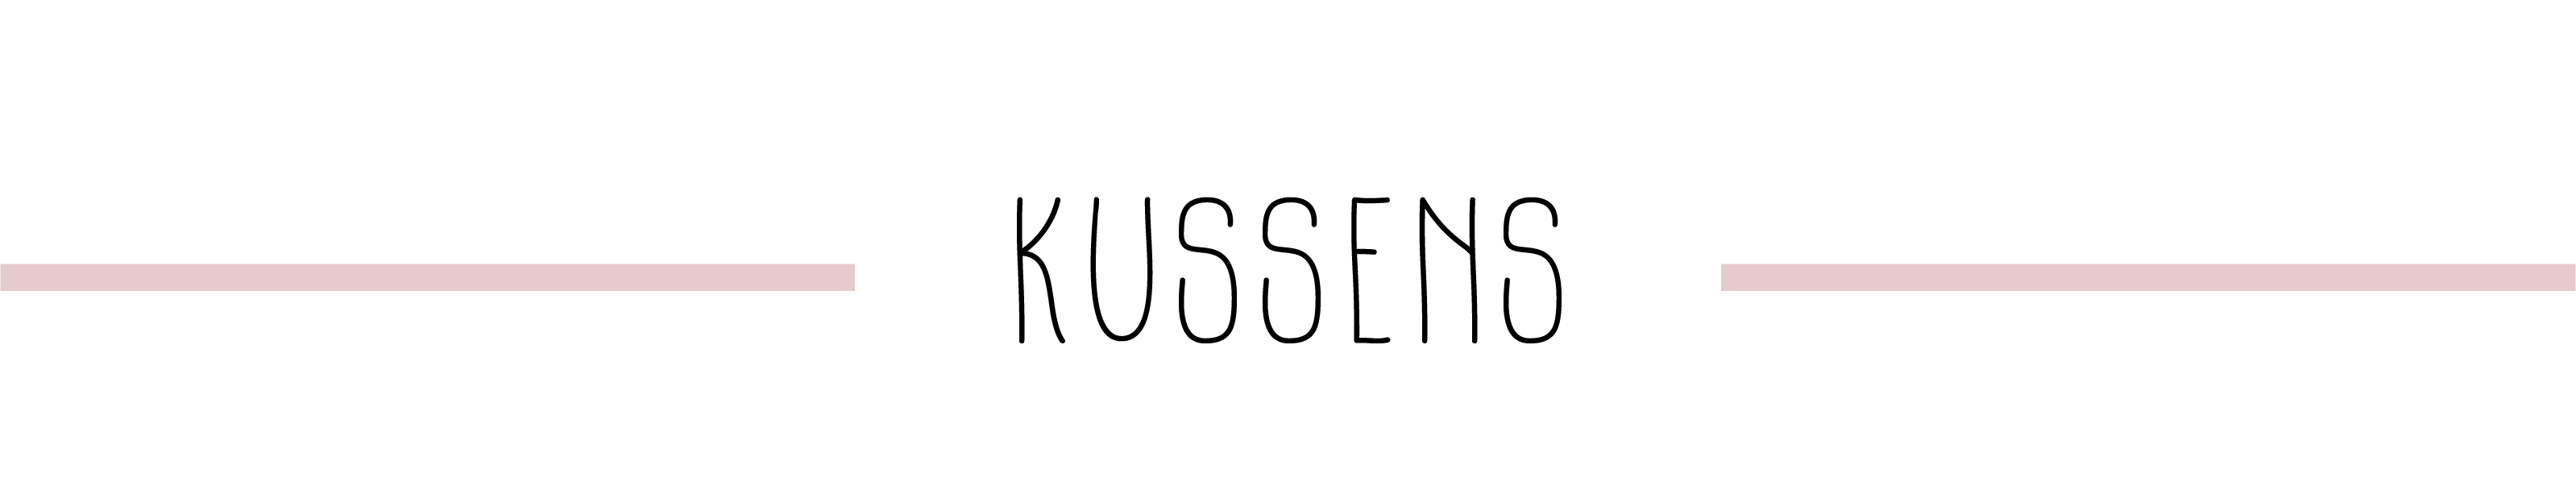 Titels - kopjes - mobile